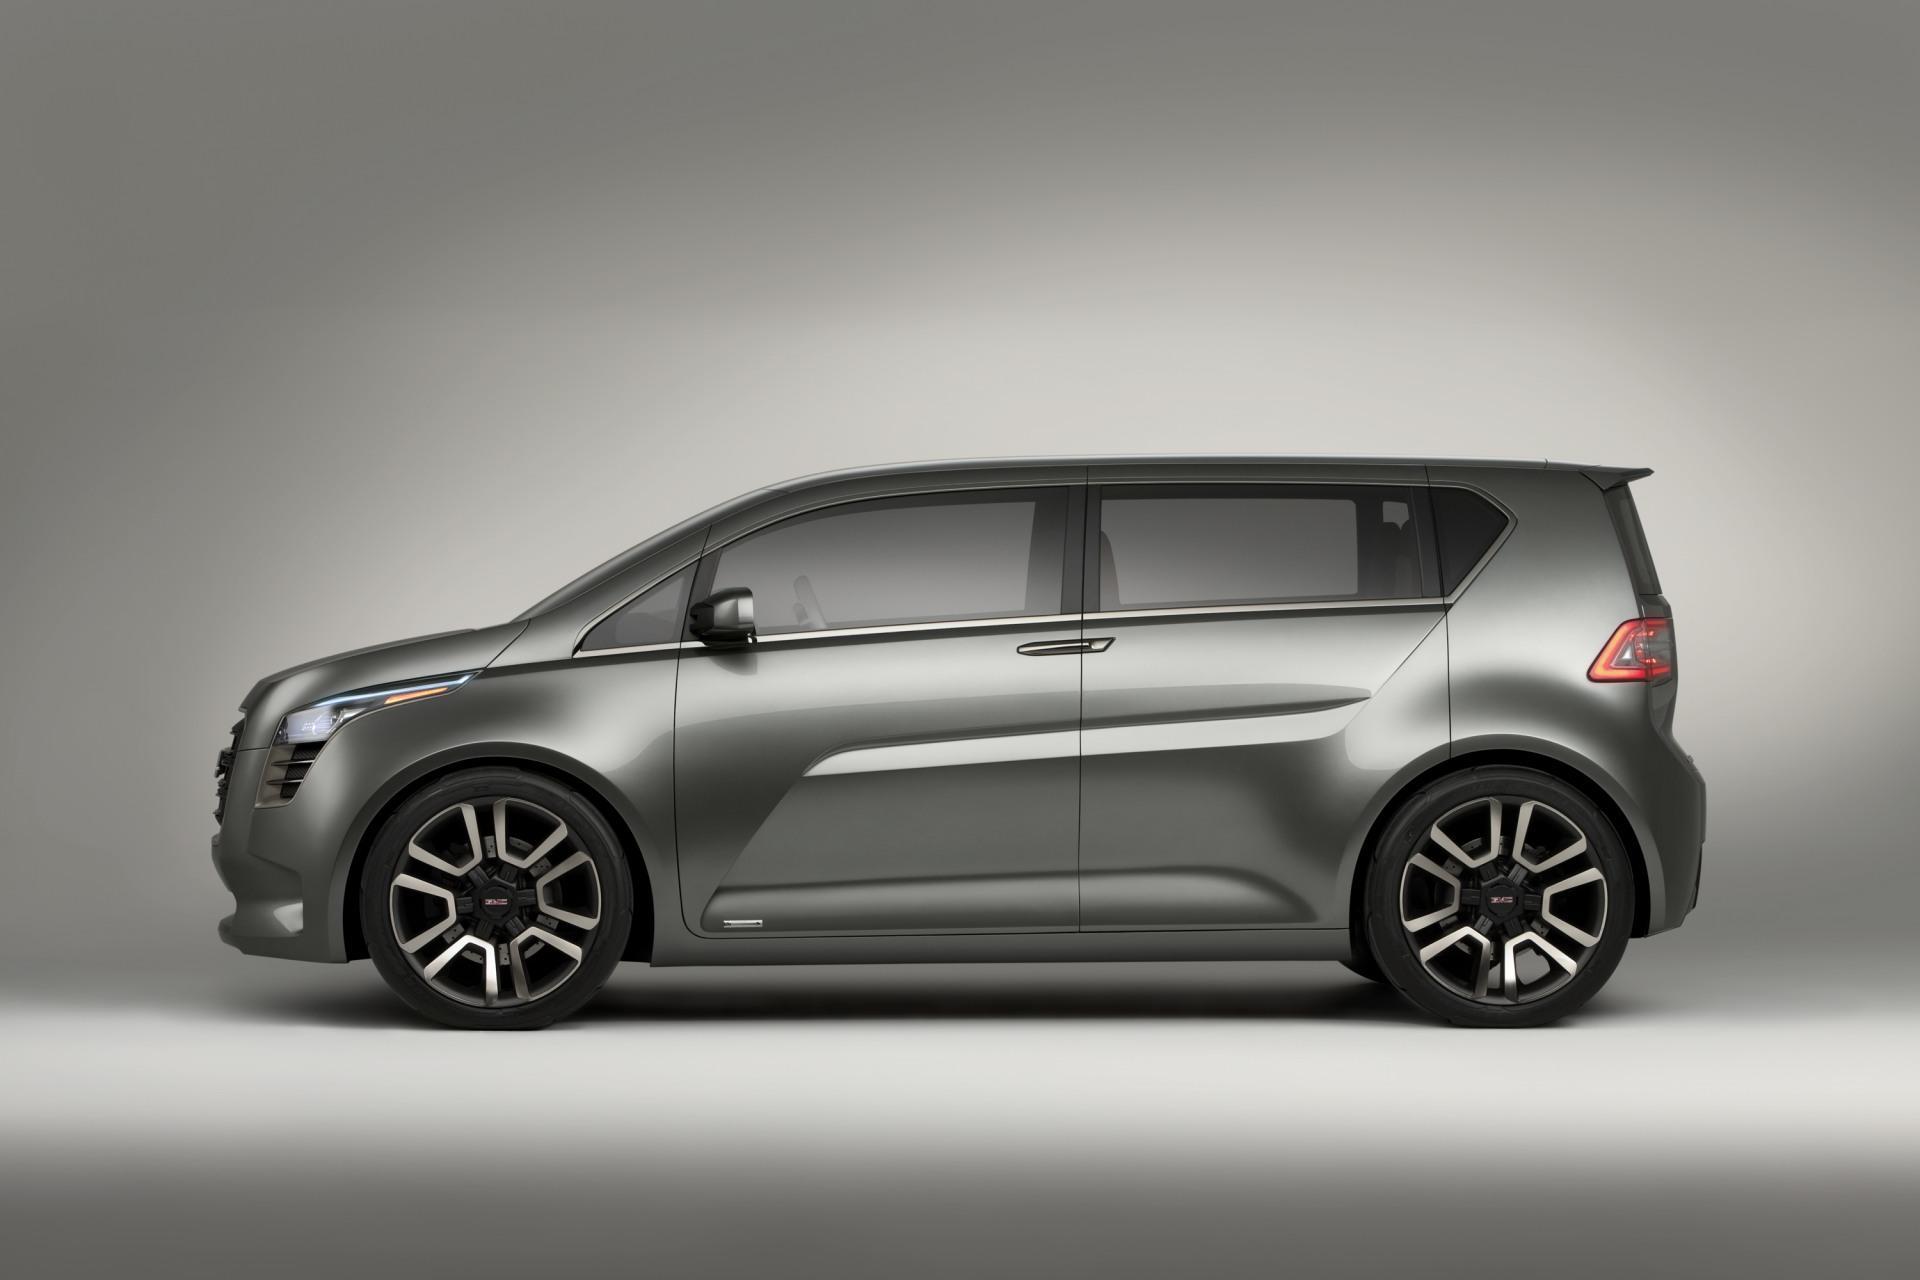 2010 GMC Granite Concept - conceptcarz.com